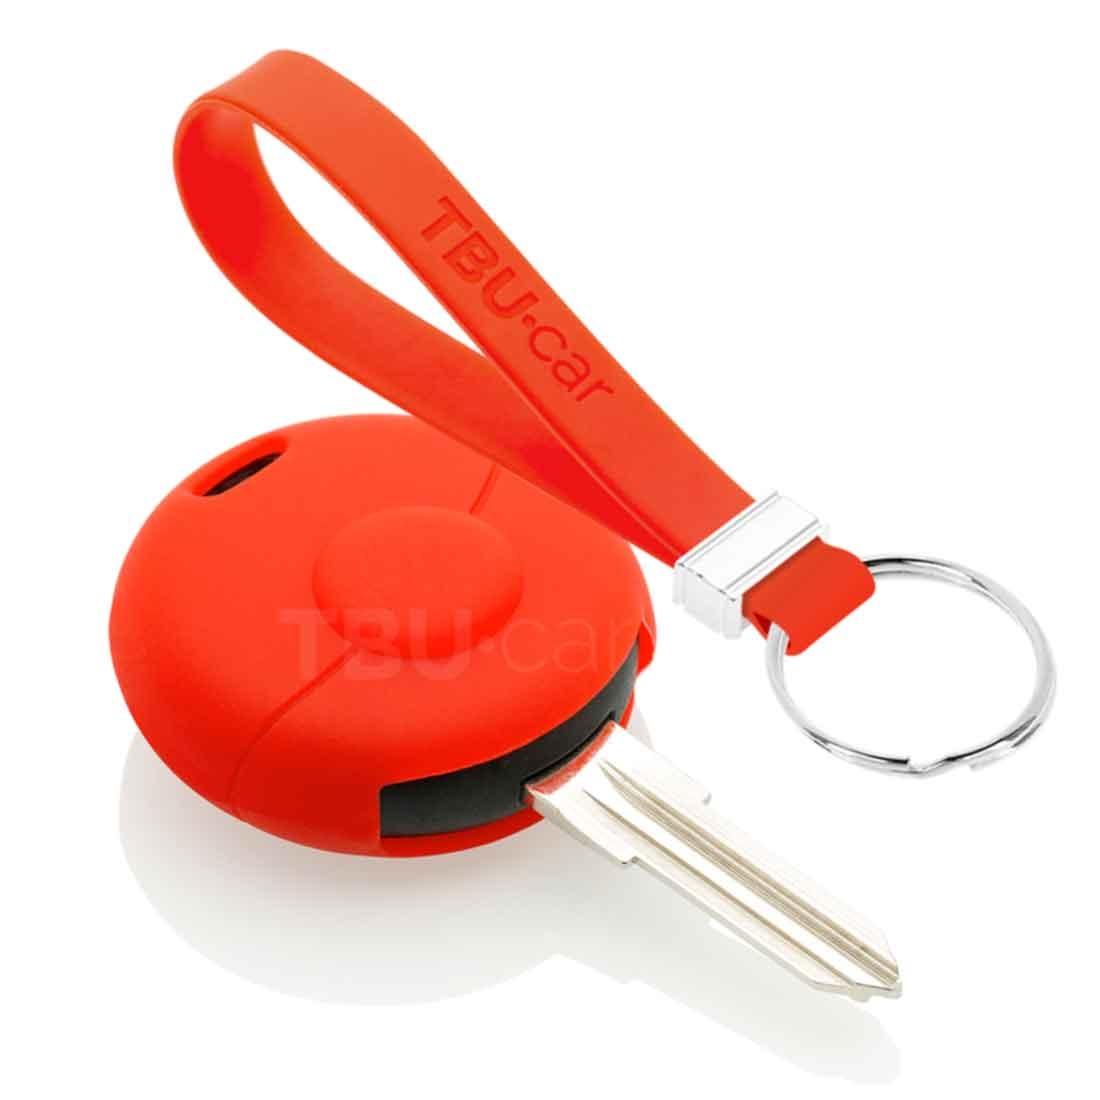 TBU car TBU car Autoschlüssel Hülle kompatibel mit Smart 1 Taste - Schutzhülle aus Silikon - Auto Schlüsselhülle Cover in Rot